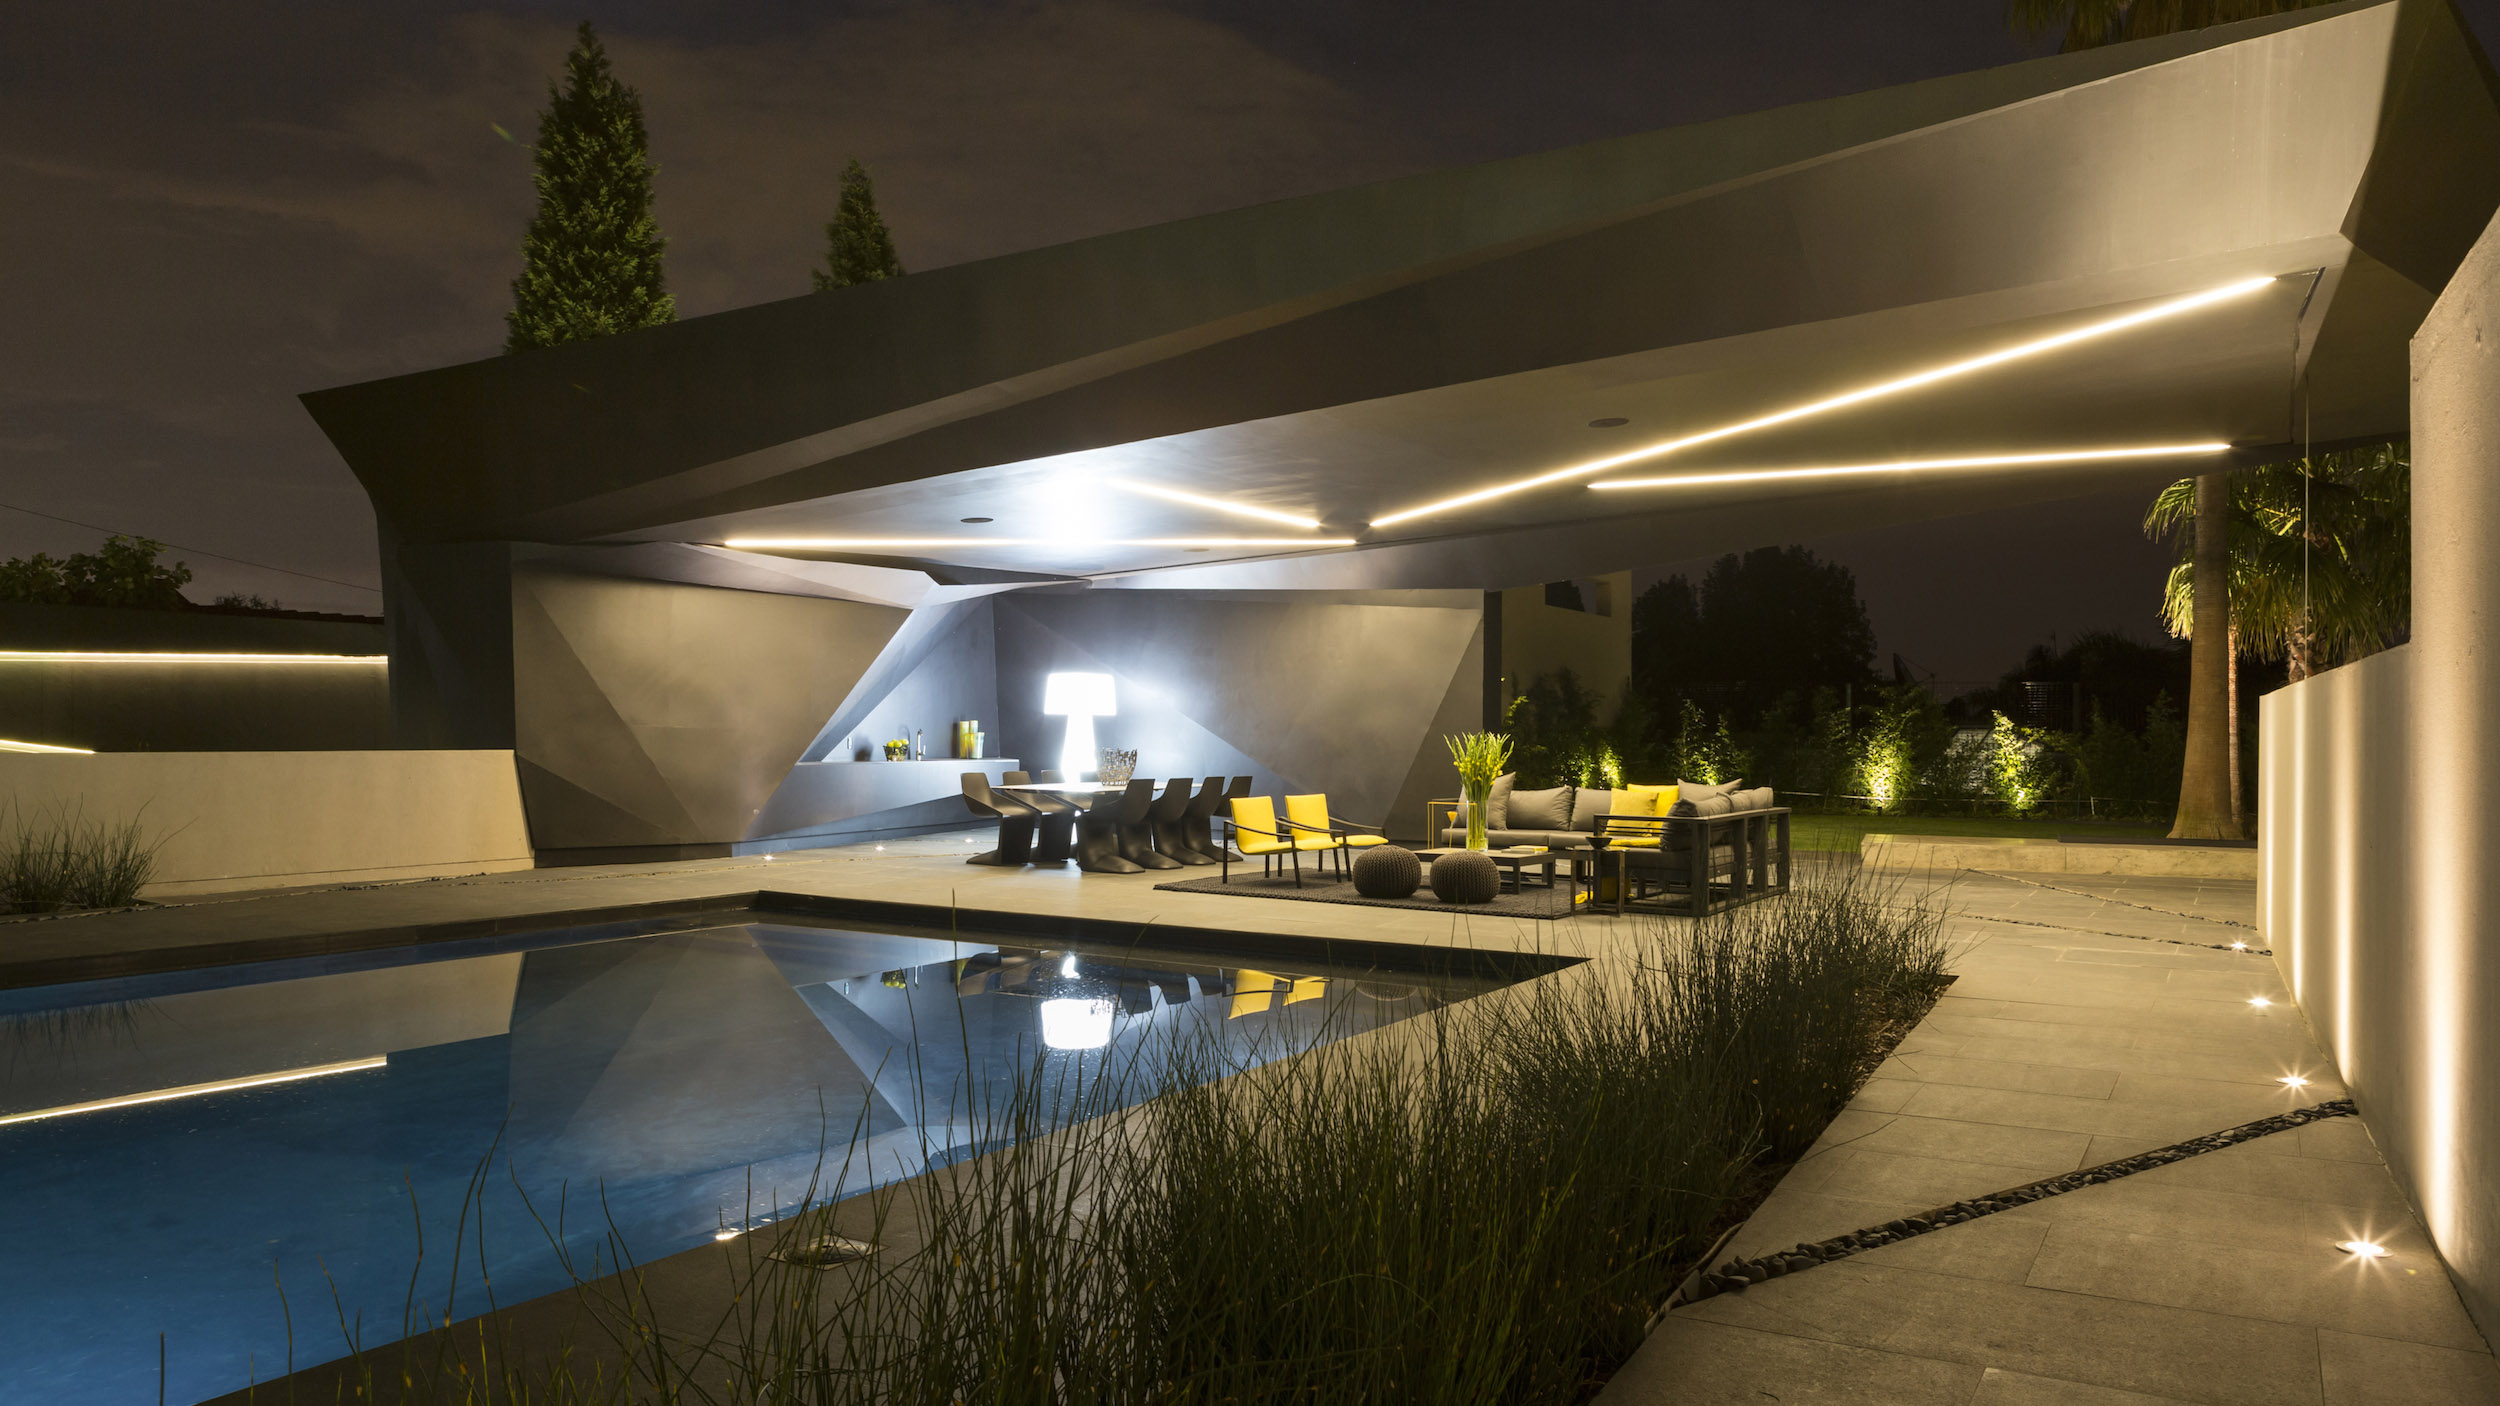 Kloof Road Masterpiece House in Johannesburg by Nico van der Meulen Architects-10